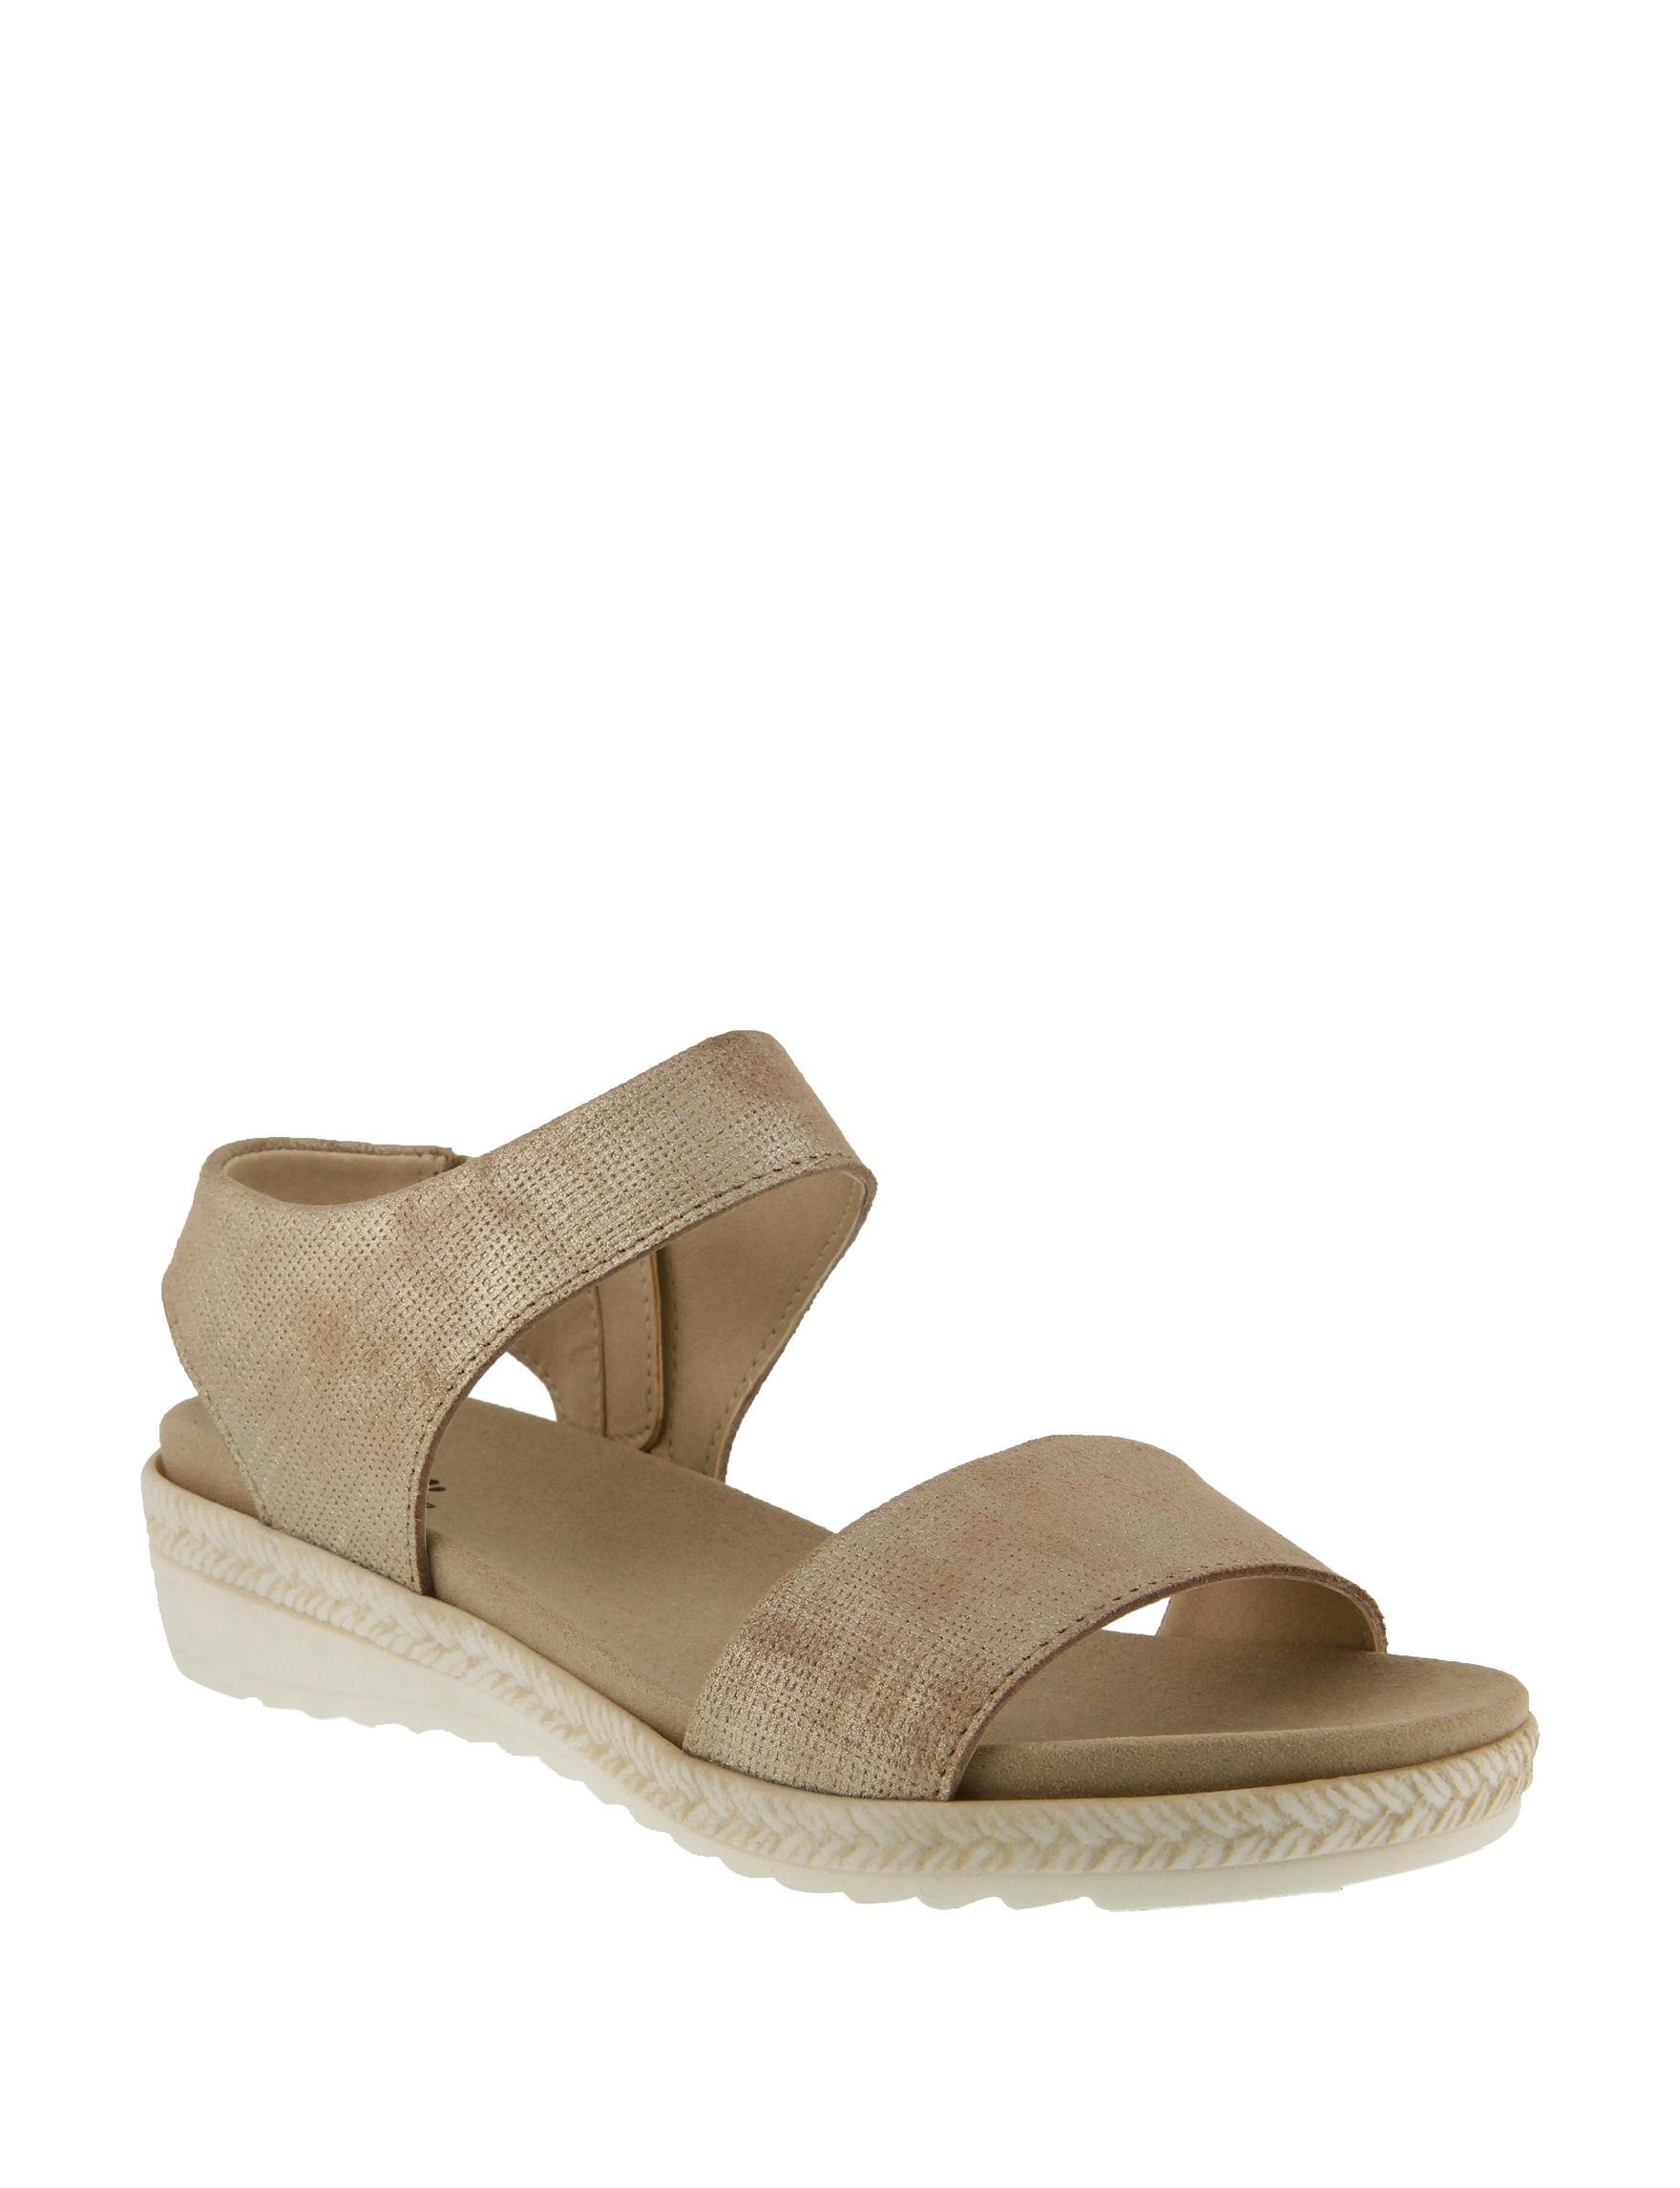 Spring Step Champagne Flat Sandals Comfort